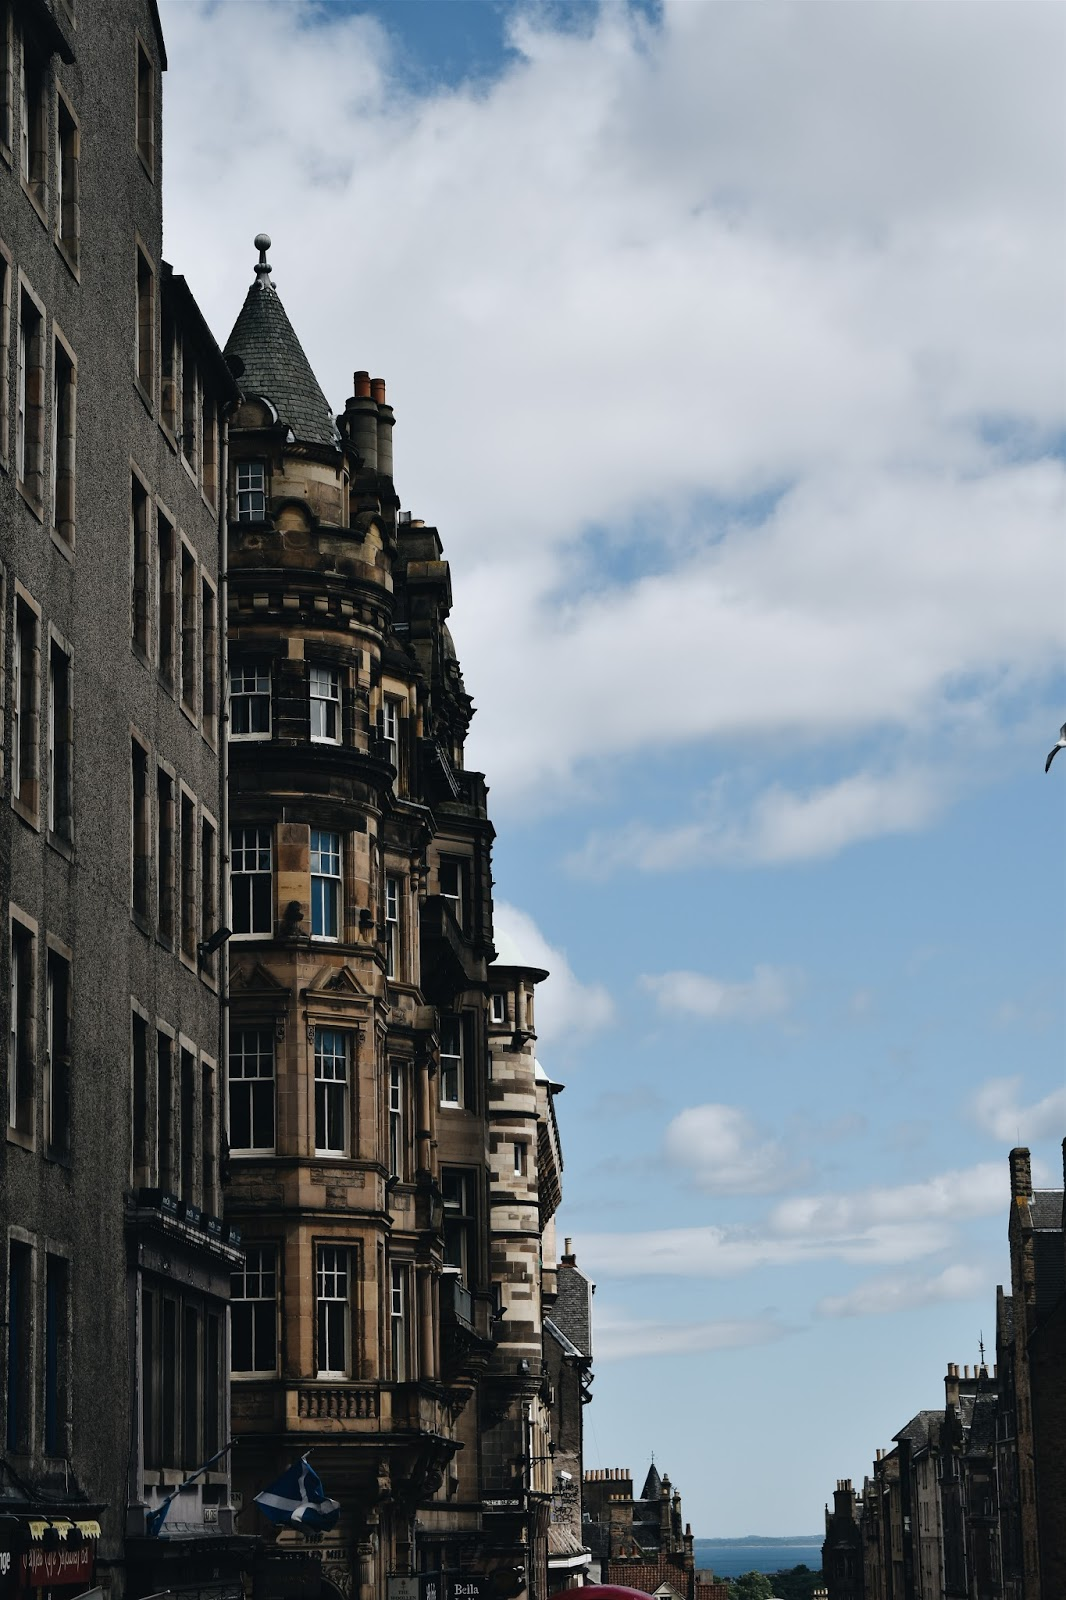 old town, scotland, edinburgh, szkocja, wycieczka, edynburg, stare miasto